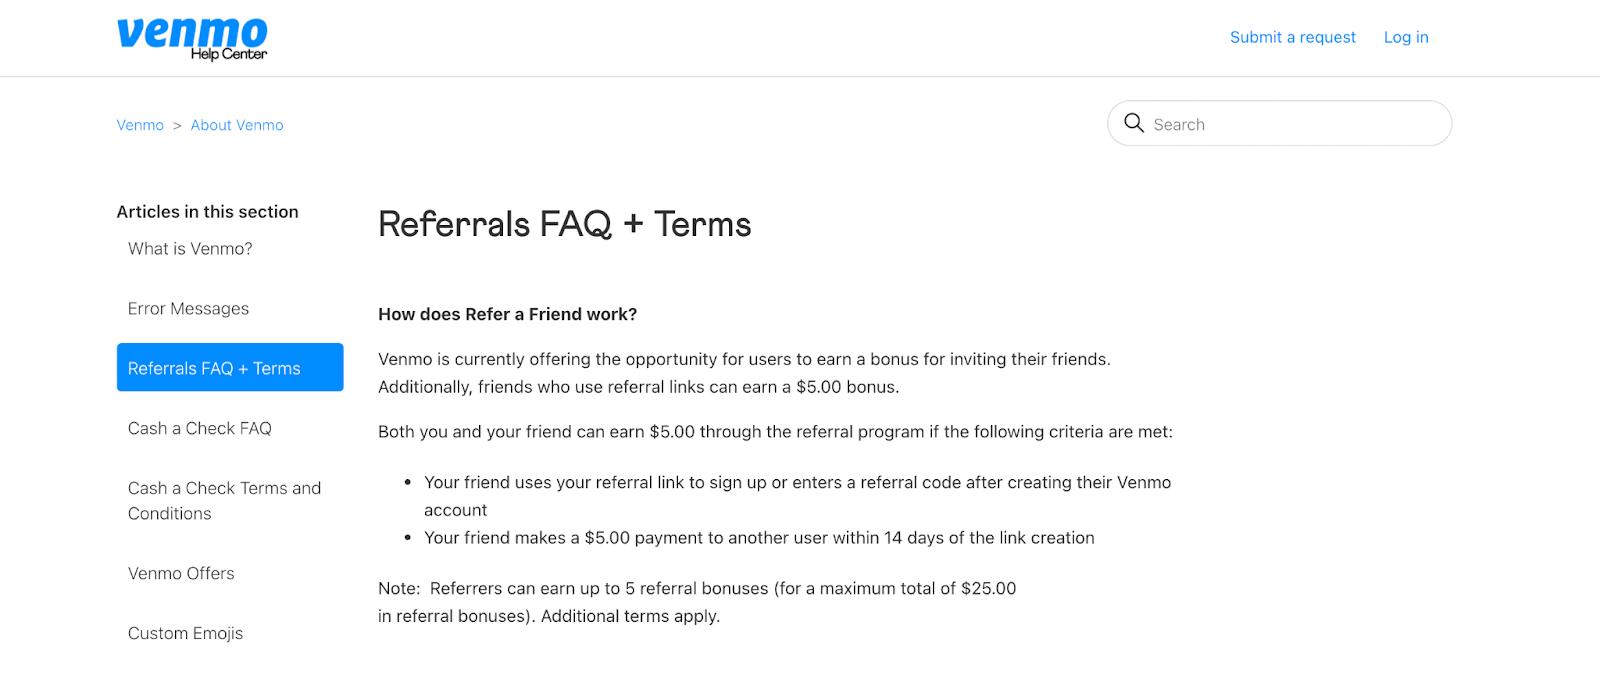 Venmo Referral Program FAQ page